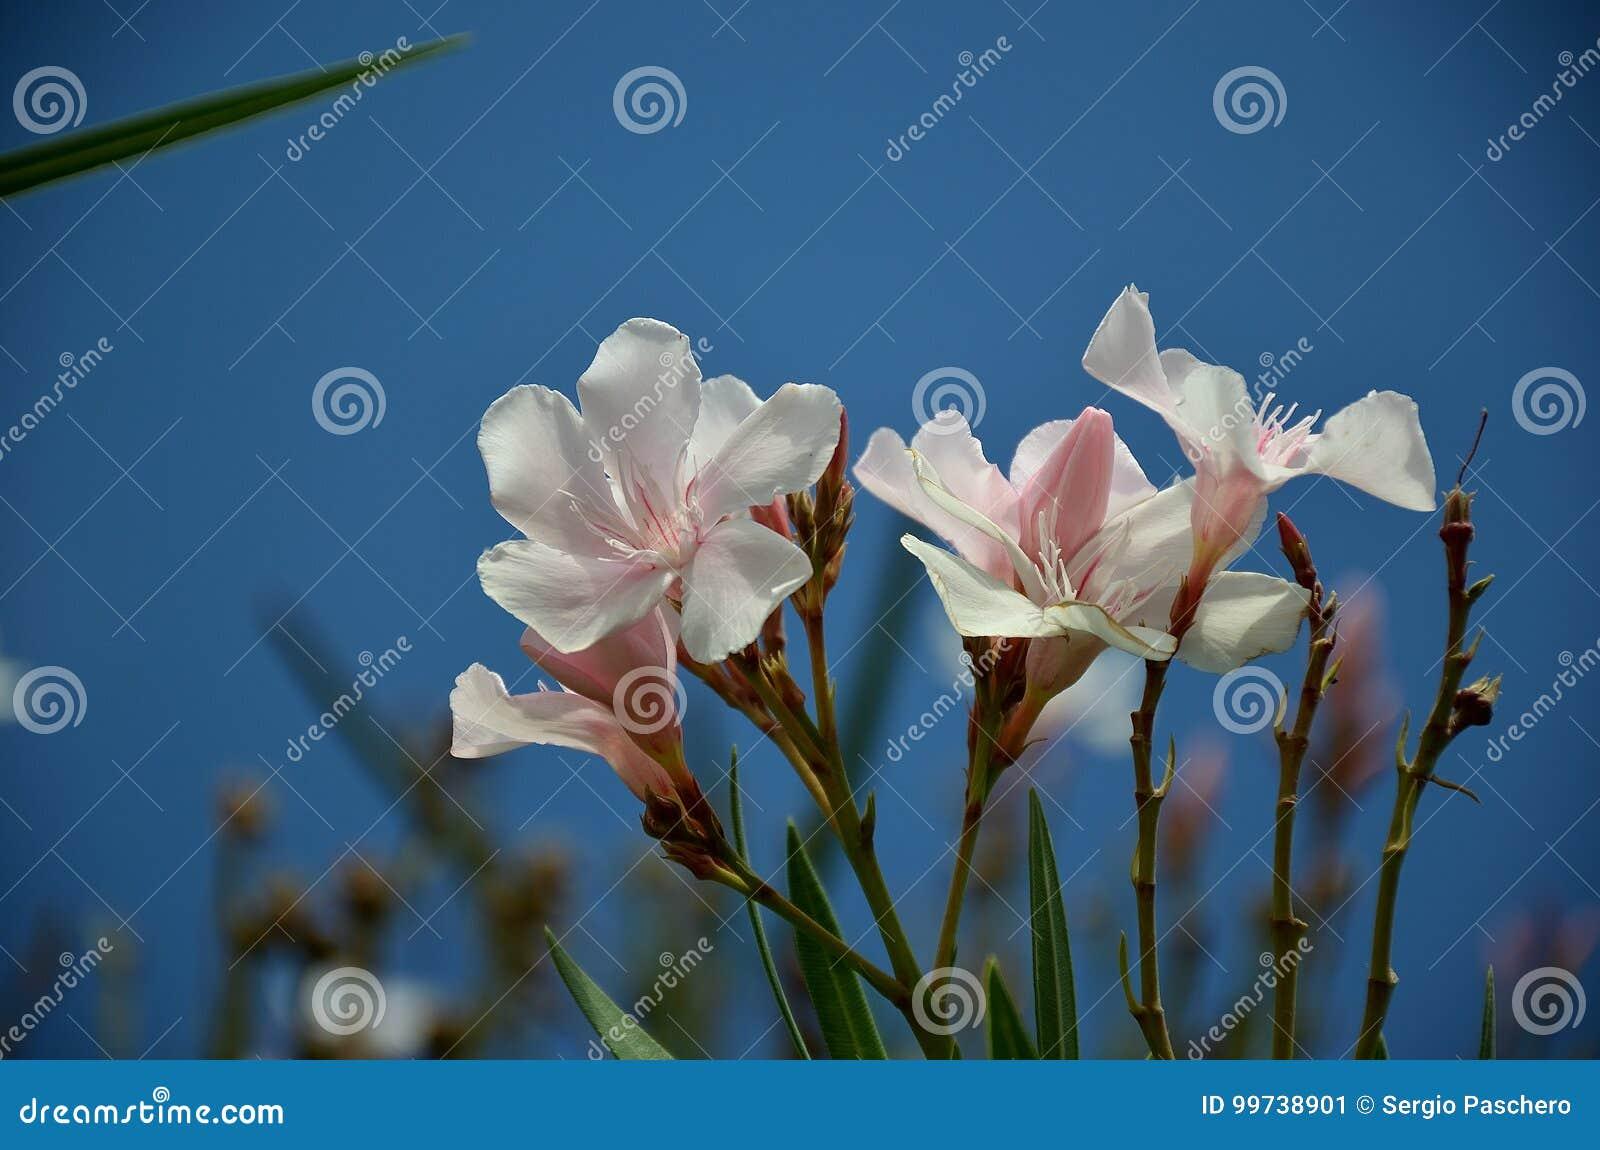 White Oleander Flower In Summer Bloom Stock Image Image Of Leaves